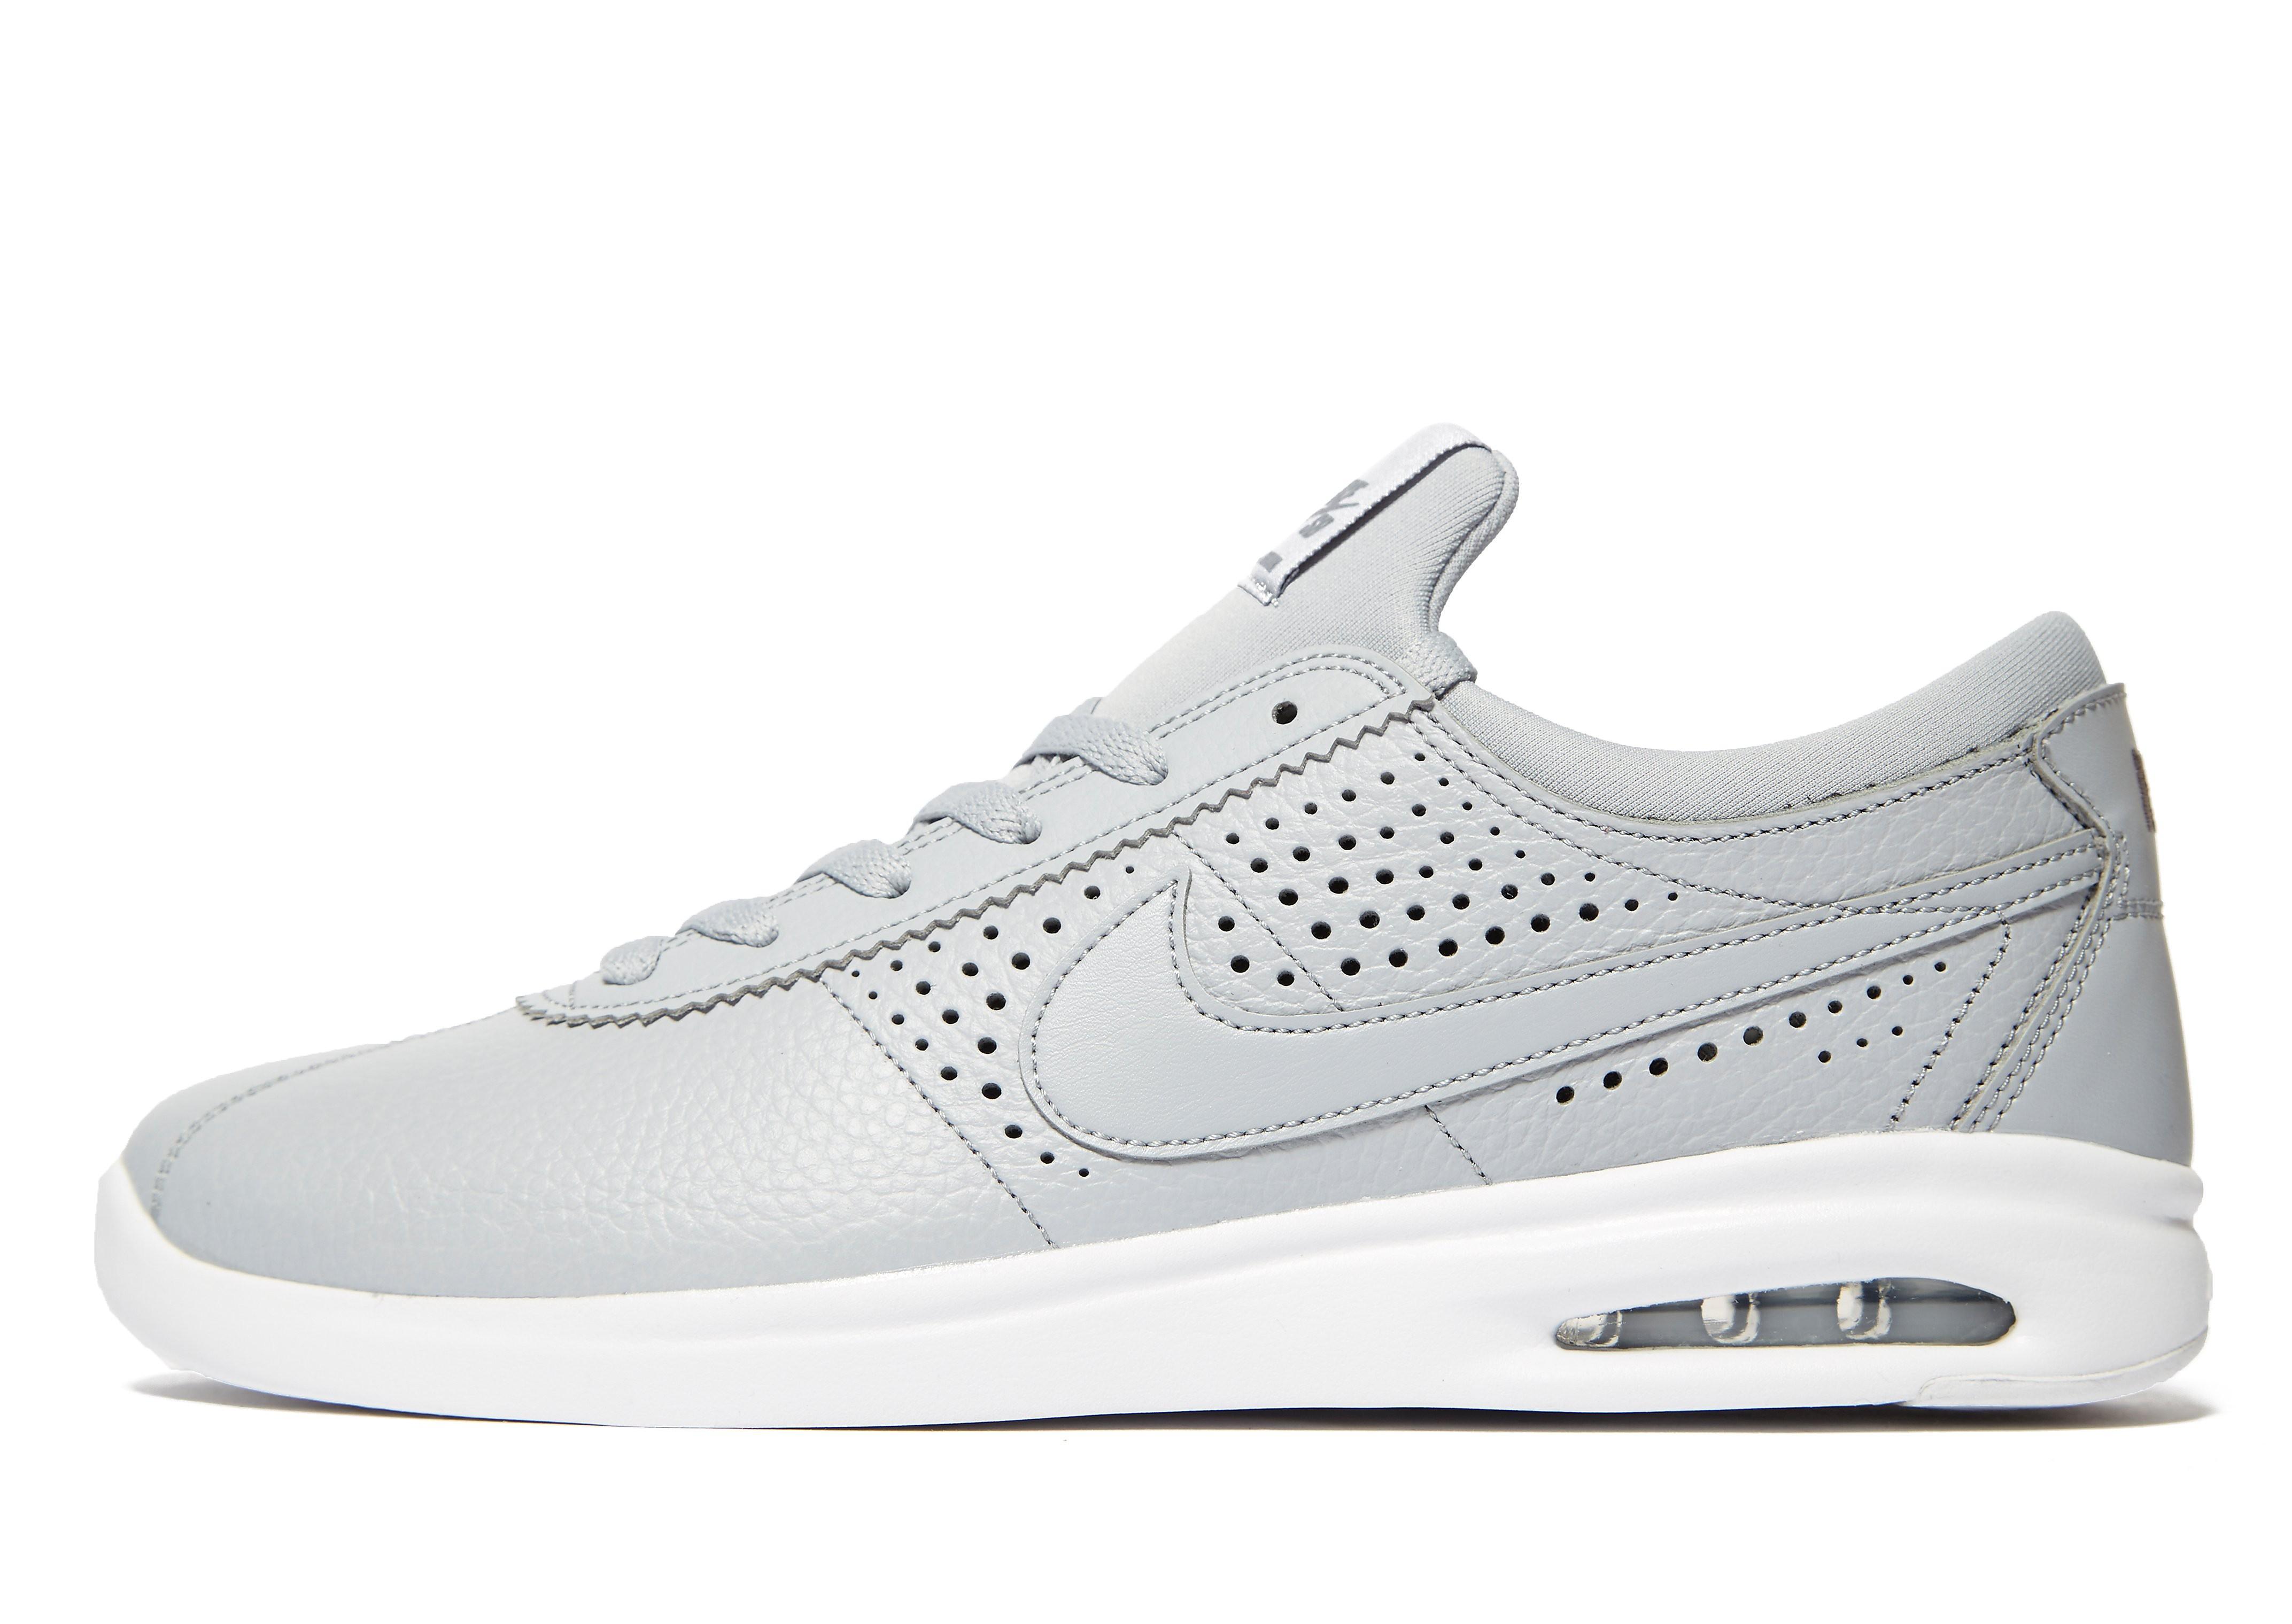 Nike Air Max Bruin Vapor